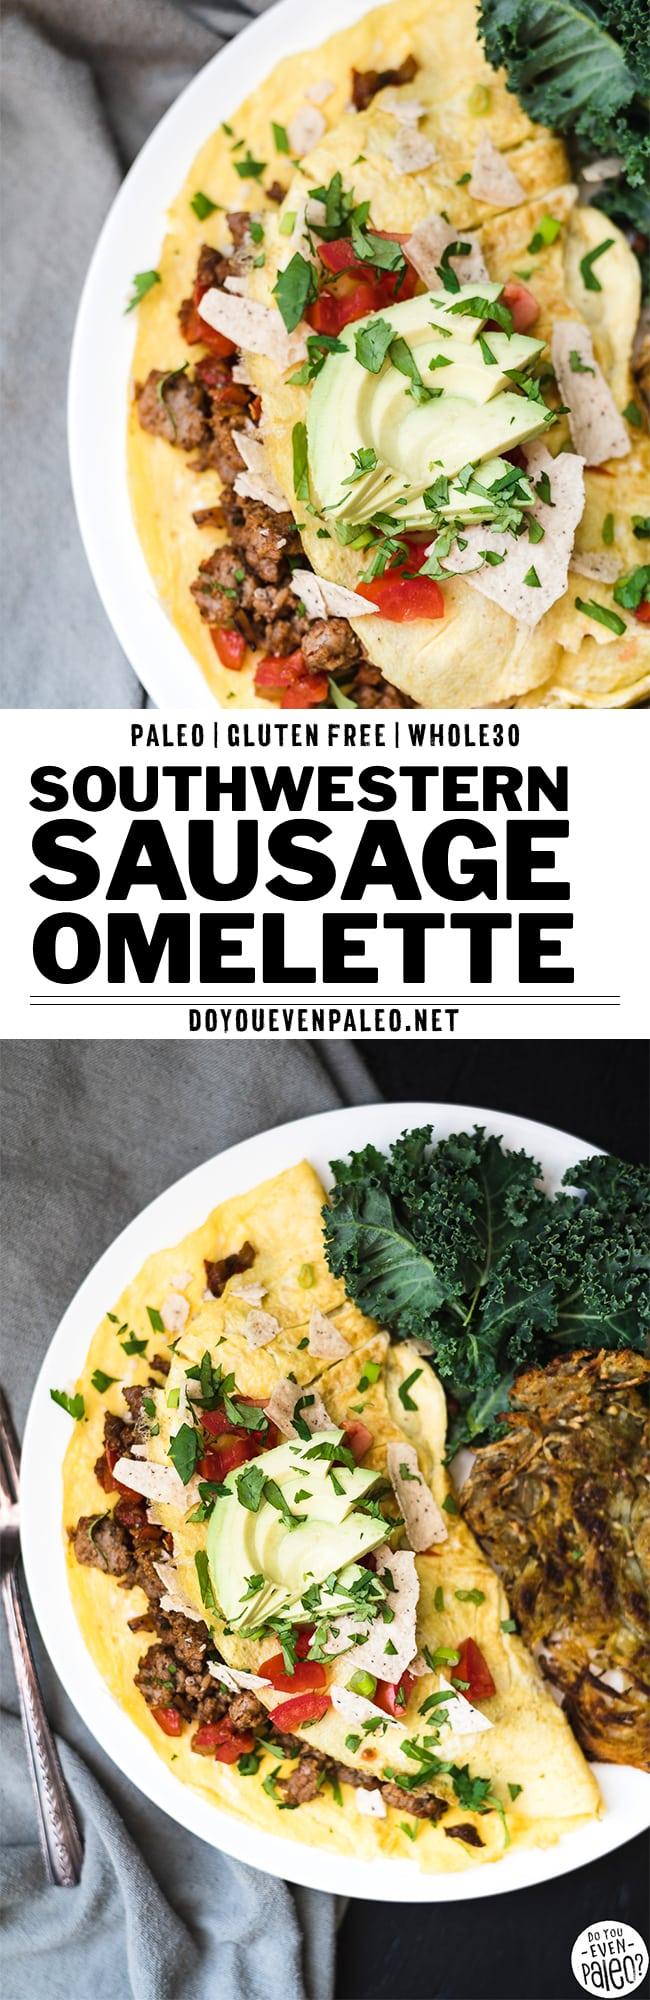 Paleo Southwestern Sausage Omelette Recipe Pin | DoYouEvenPaleo.net